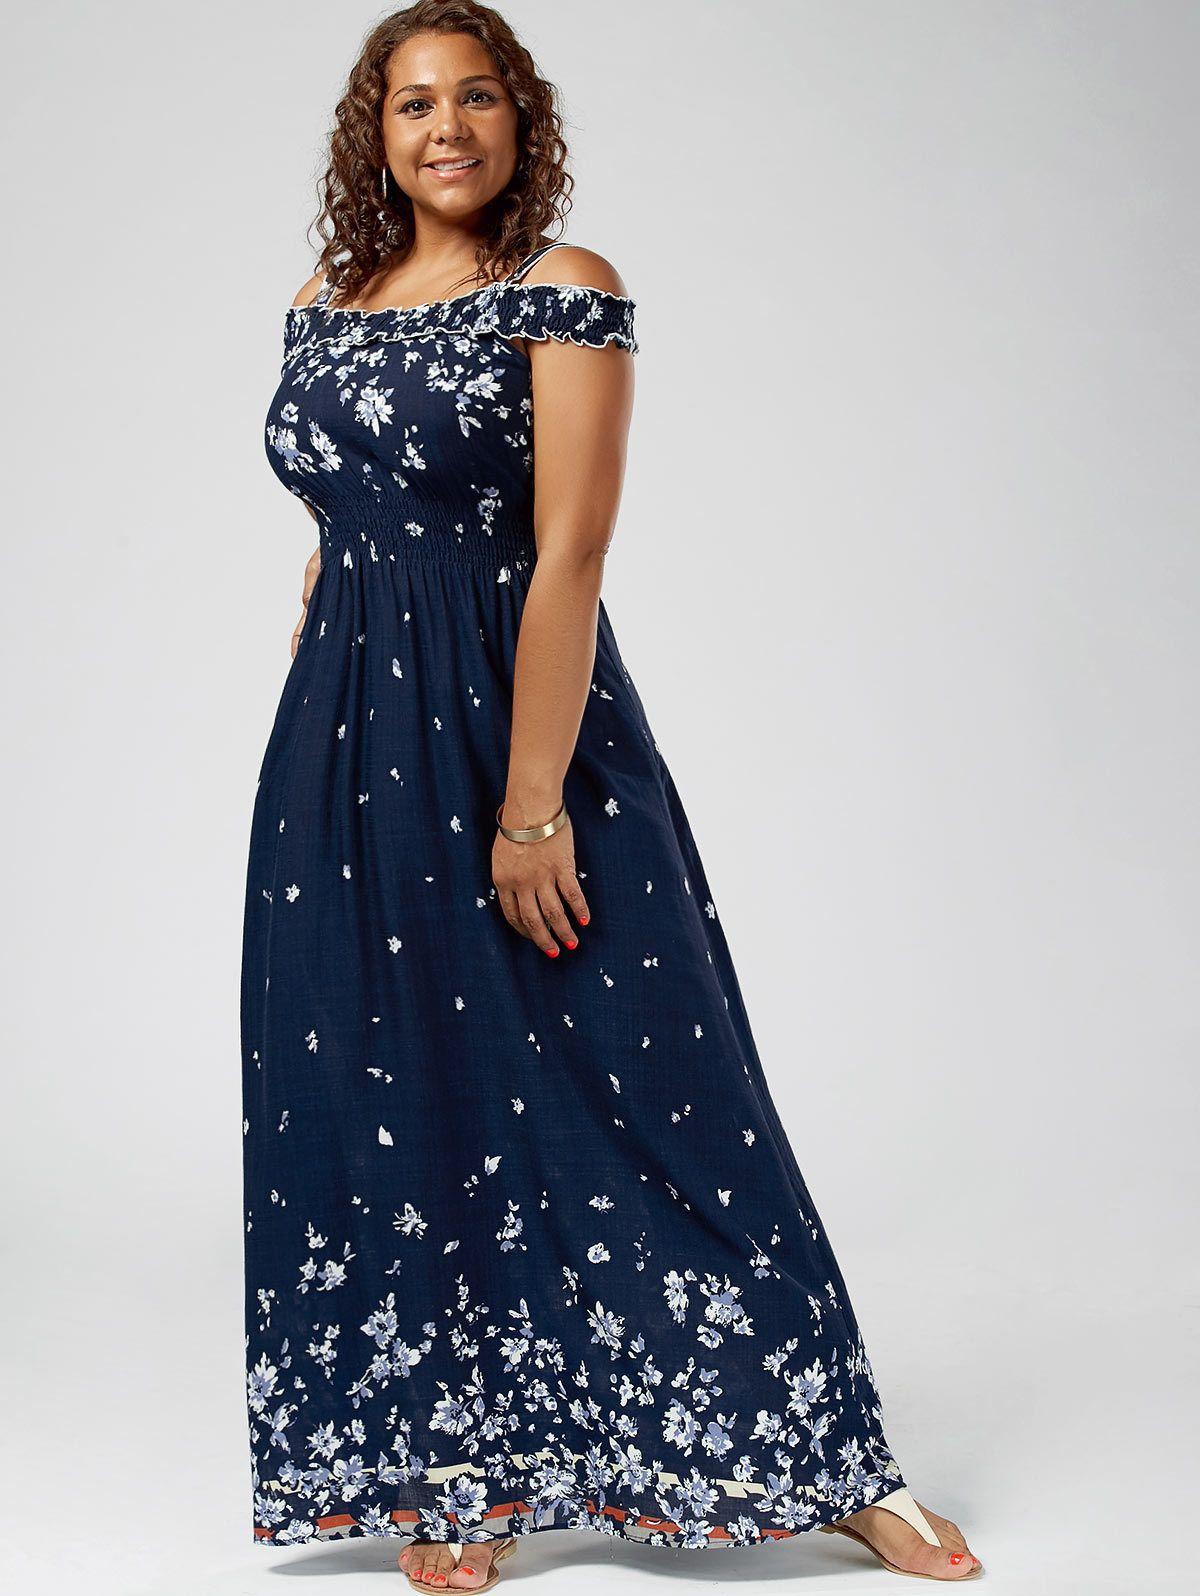 6b472b1a01b 2019 Wipalo Women Empire Waist Maxi Dresses Plus Size Floral Print Cold  Shoulder Long Dresses Bohemian Female Short Sleeves Vestidos Y190425 From  Jinmei02